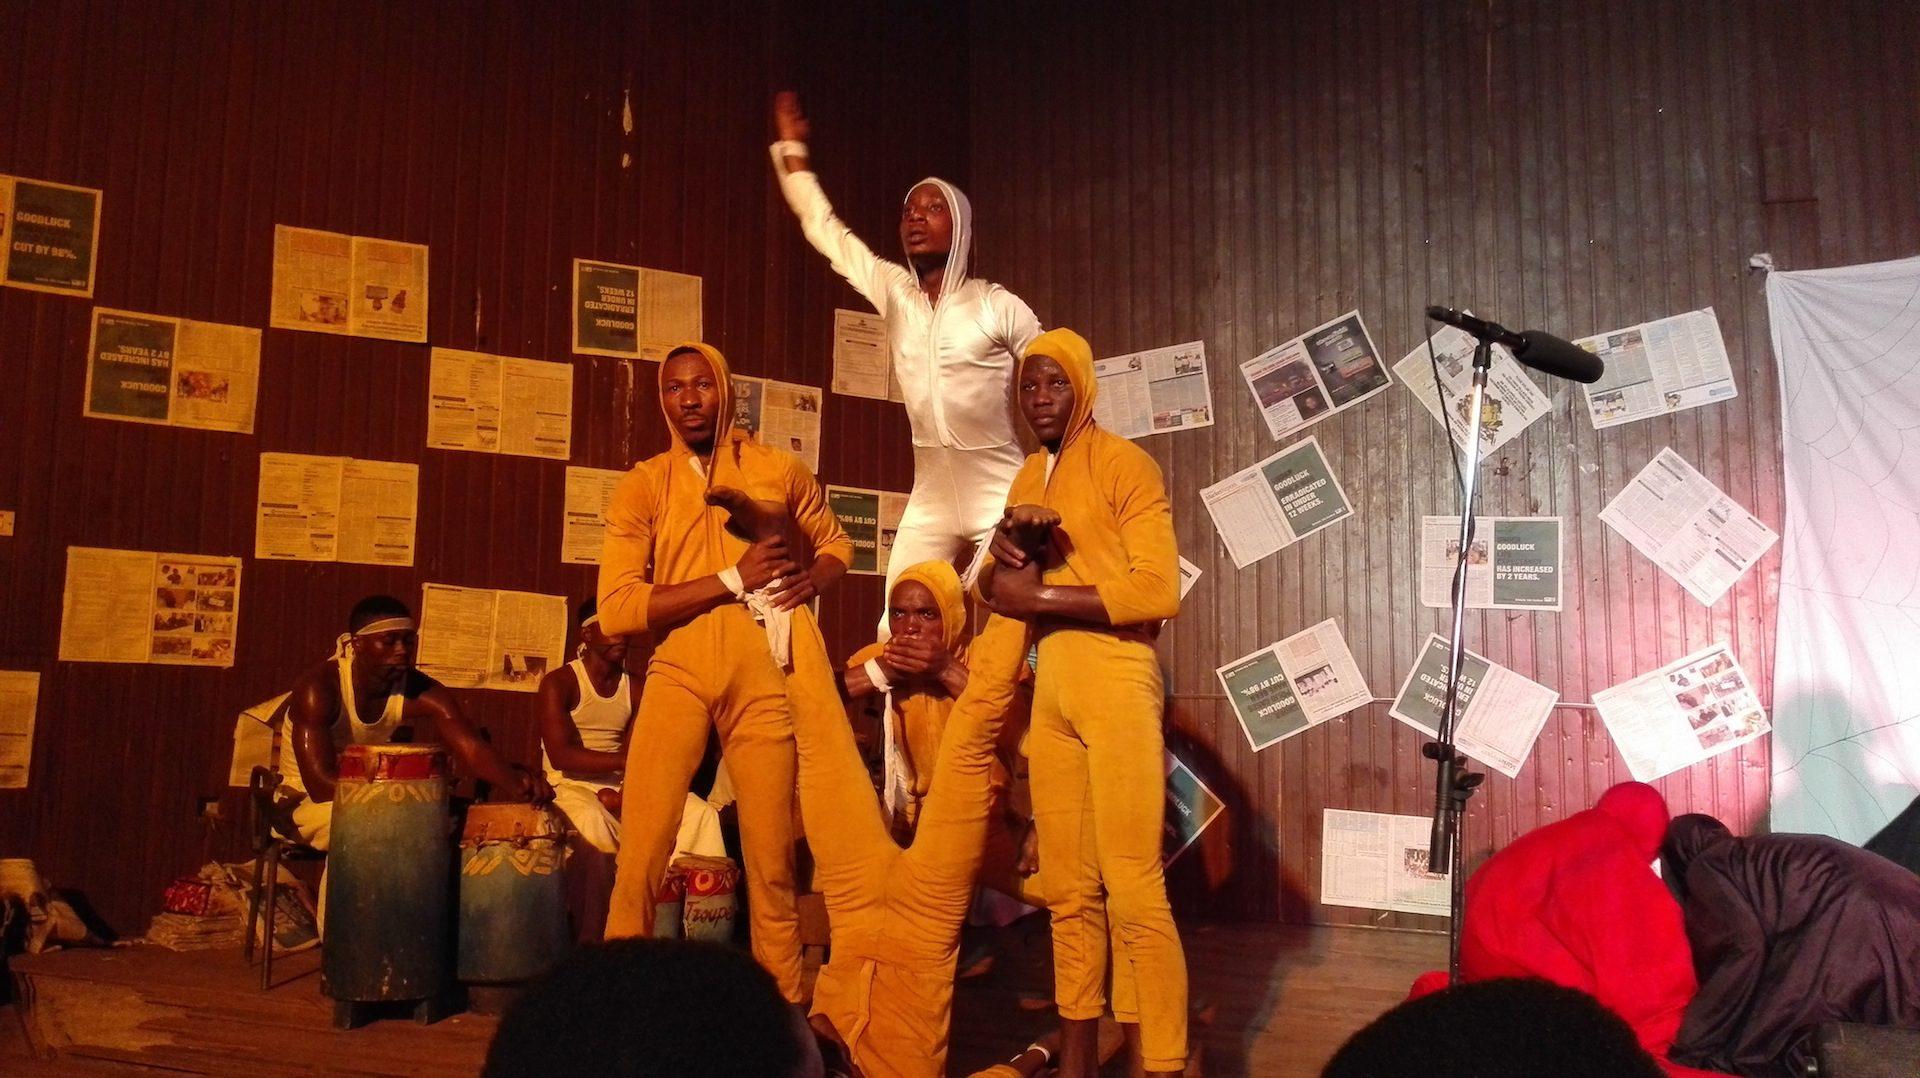 1. Segun Adefila - Kongi's Harvest by Wole Soyinka, play, July 28th, 2015 at University of Lagos Kopie 2